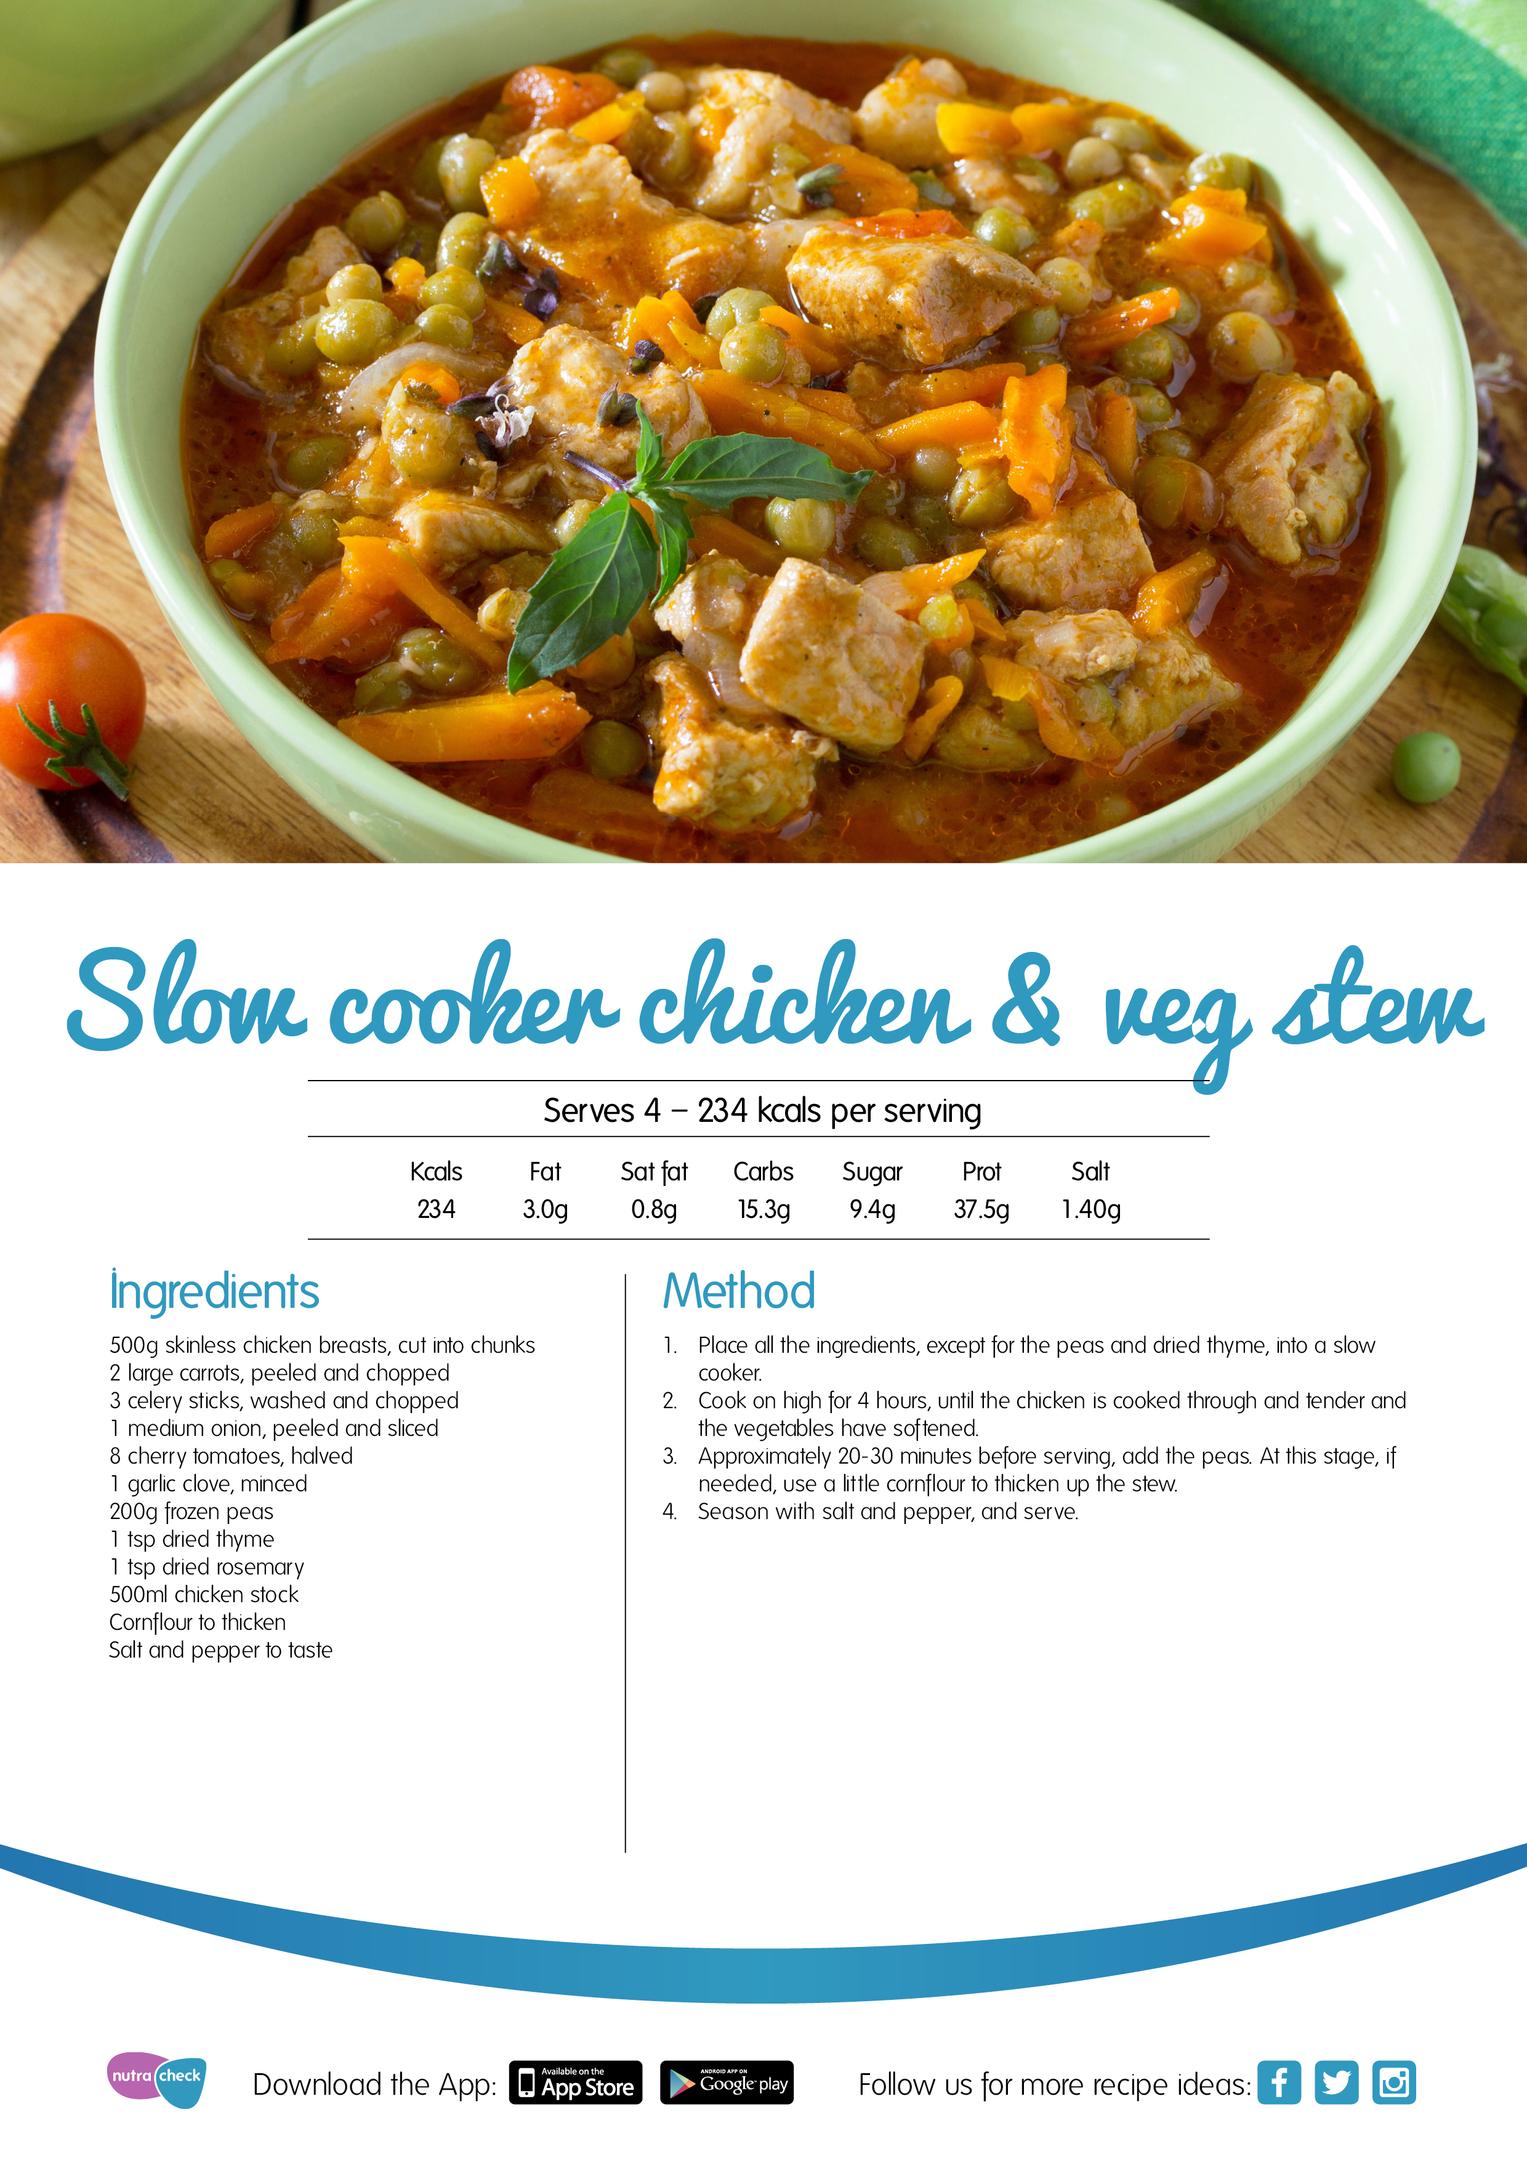 Slower cooker chicken and veg stew